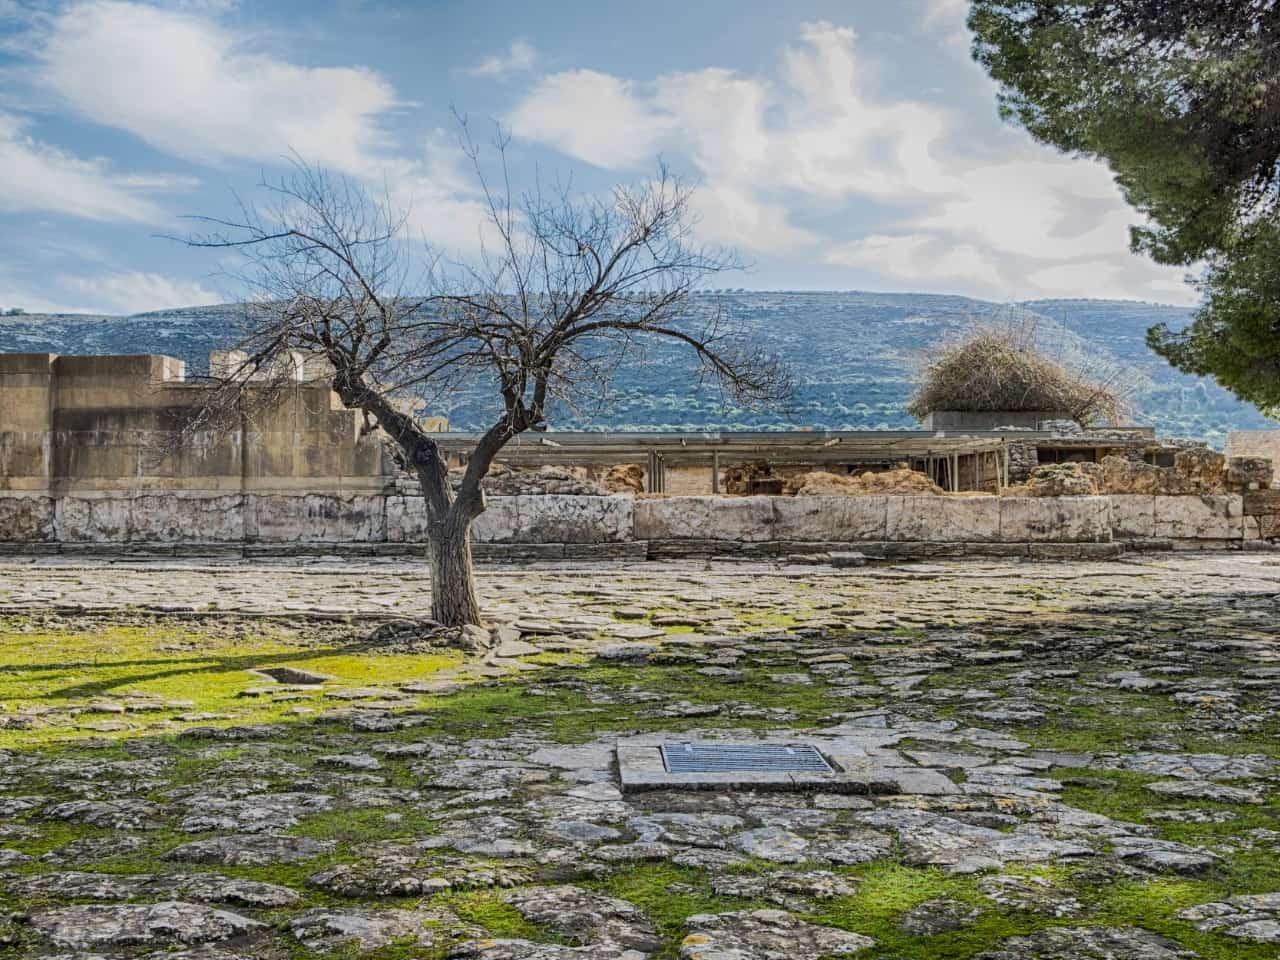 Knossos to Host Minos Opera Tribute to Cretan Explorer Kalokairinos